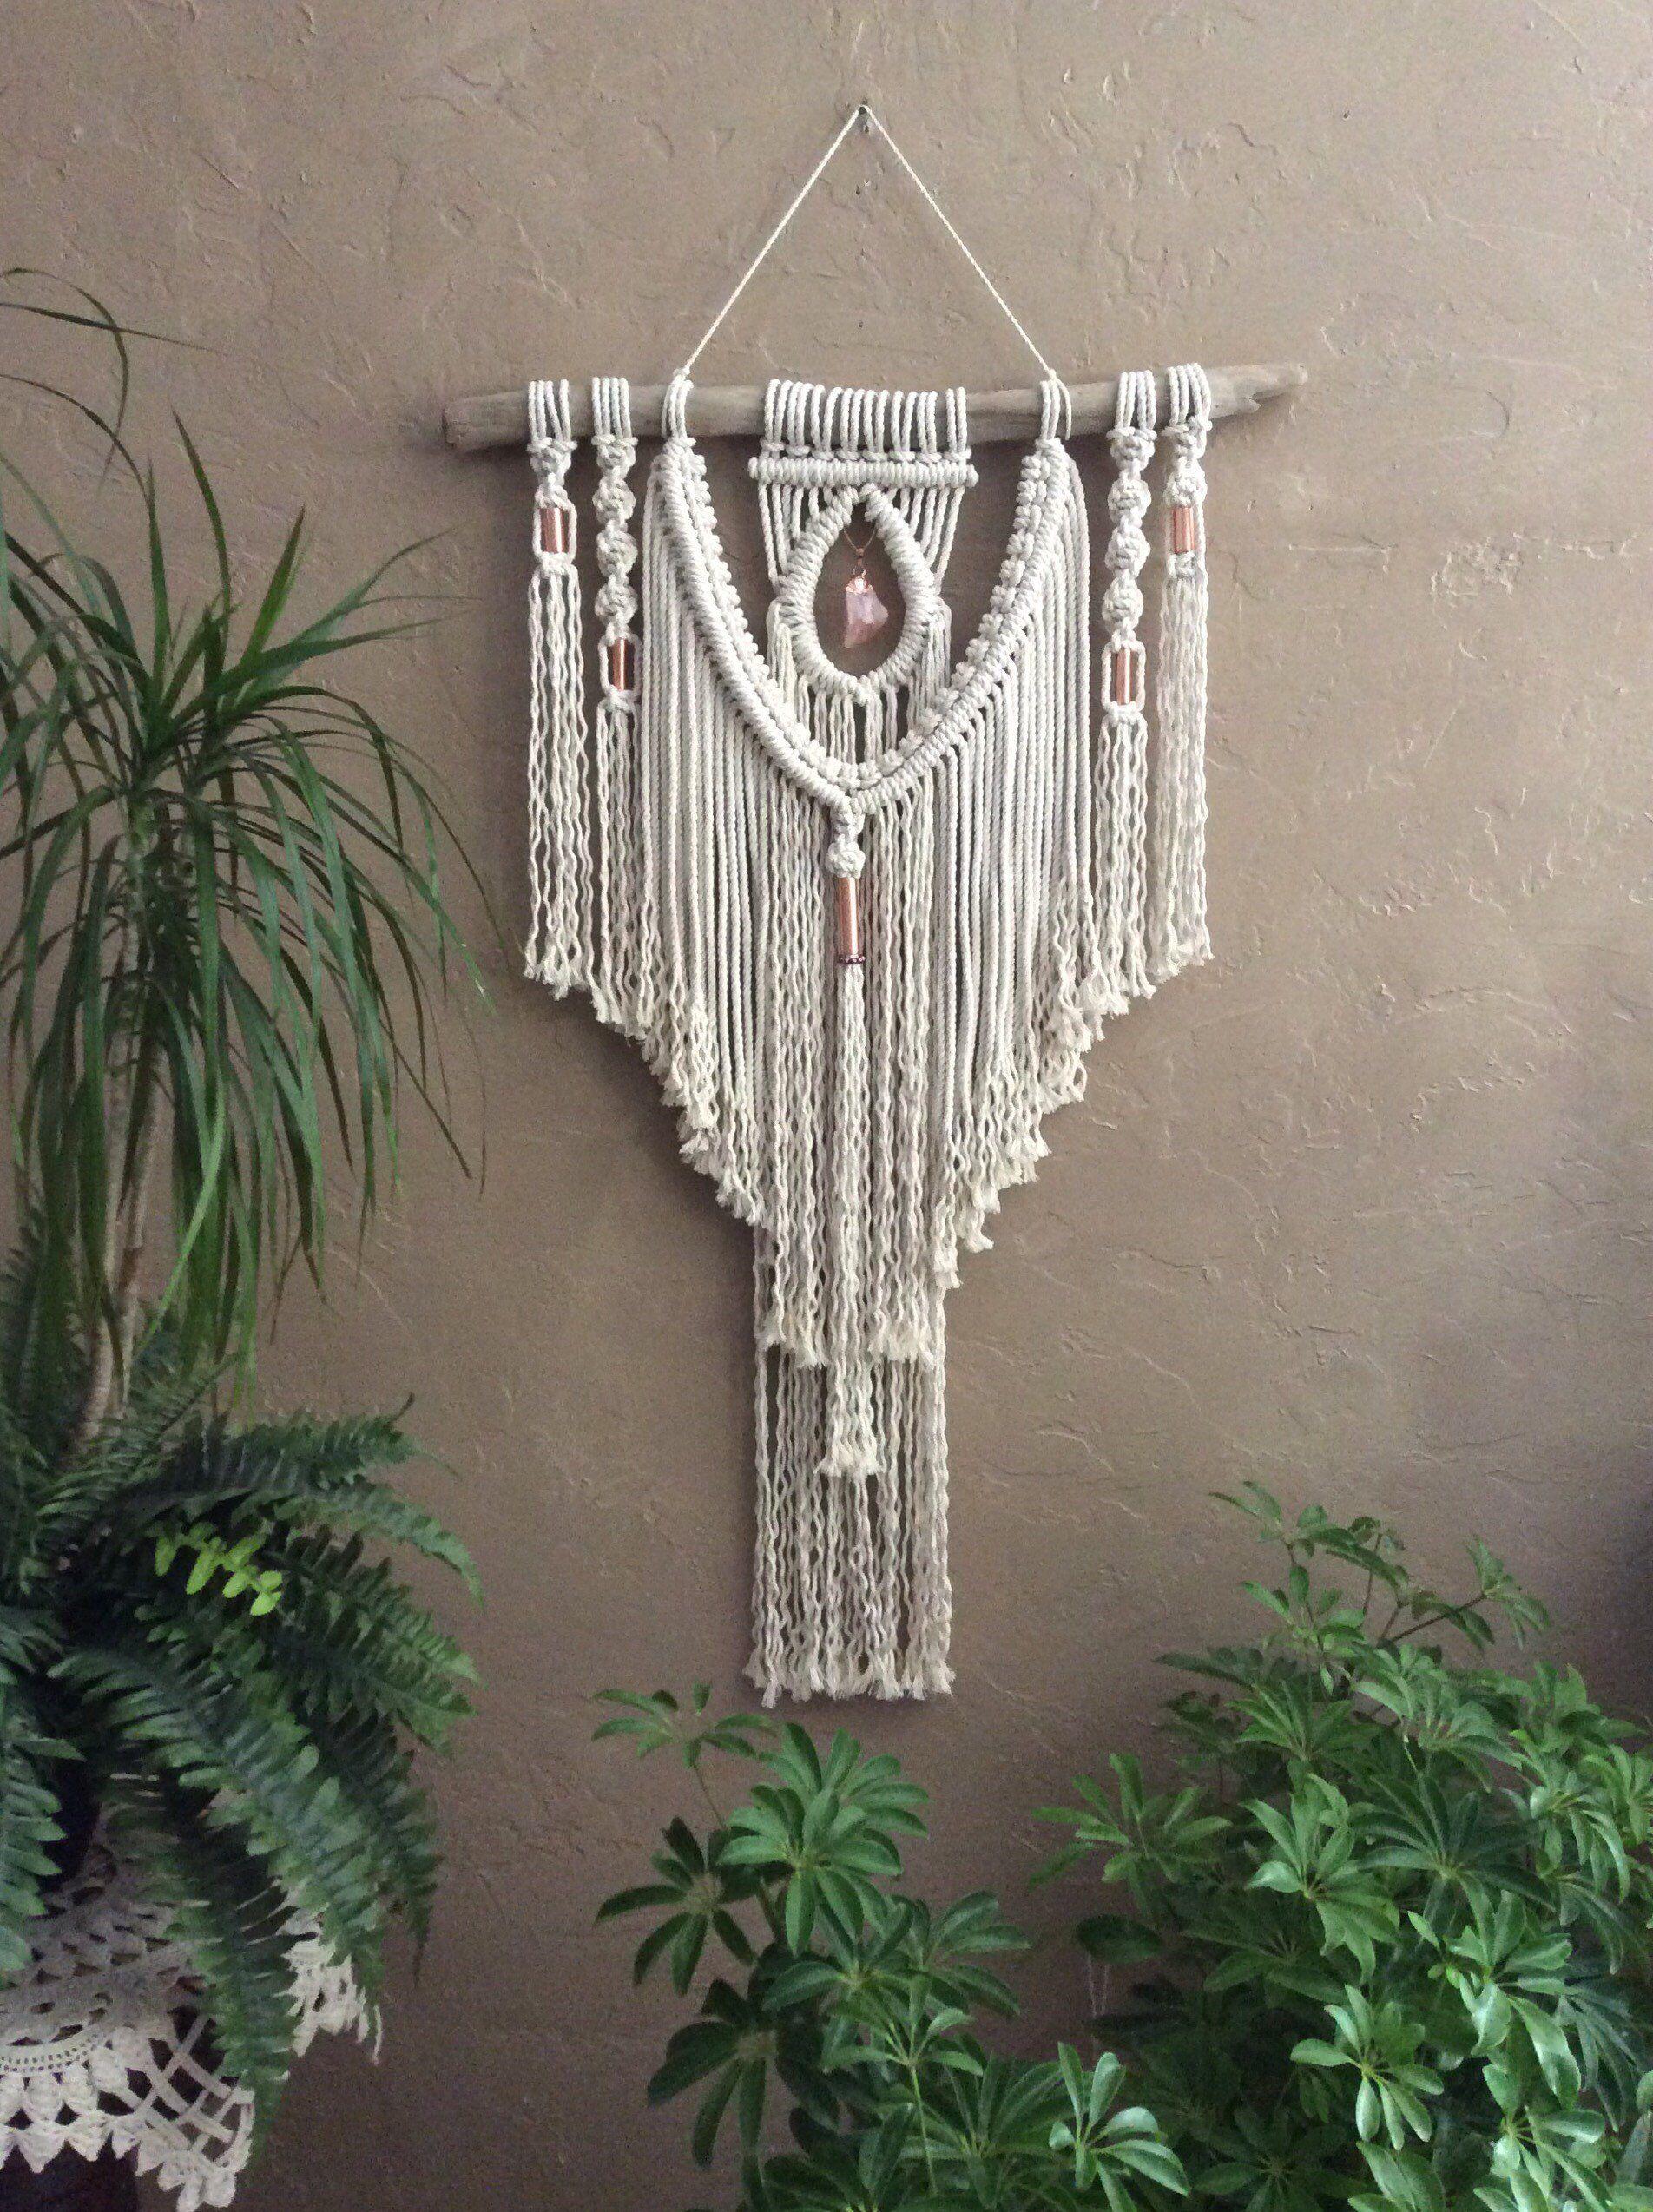 Macrame Wall Hanging On Driftwood Bohemian Decor Macrame Crystal